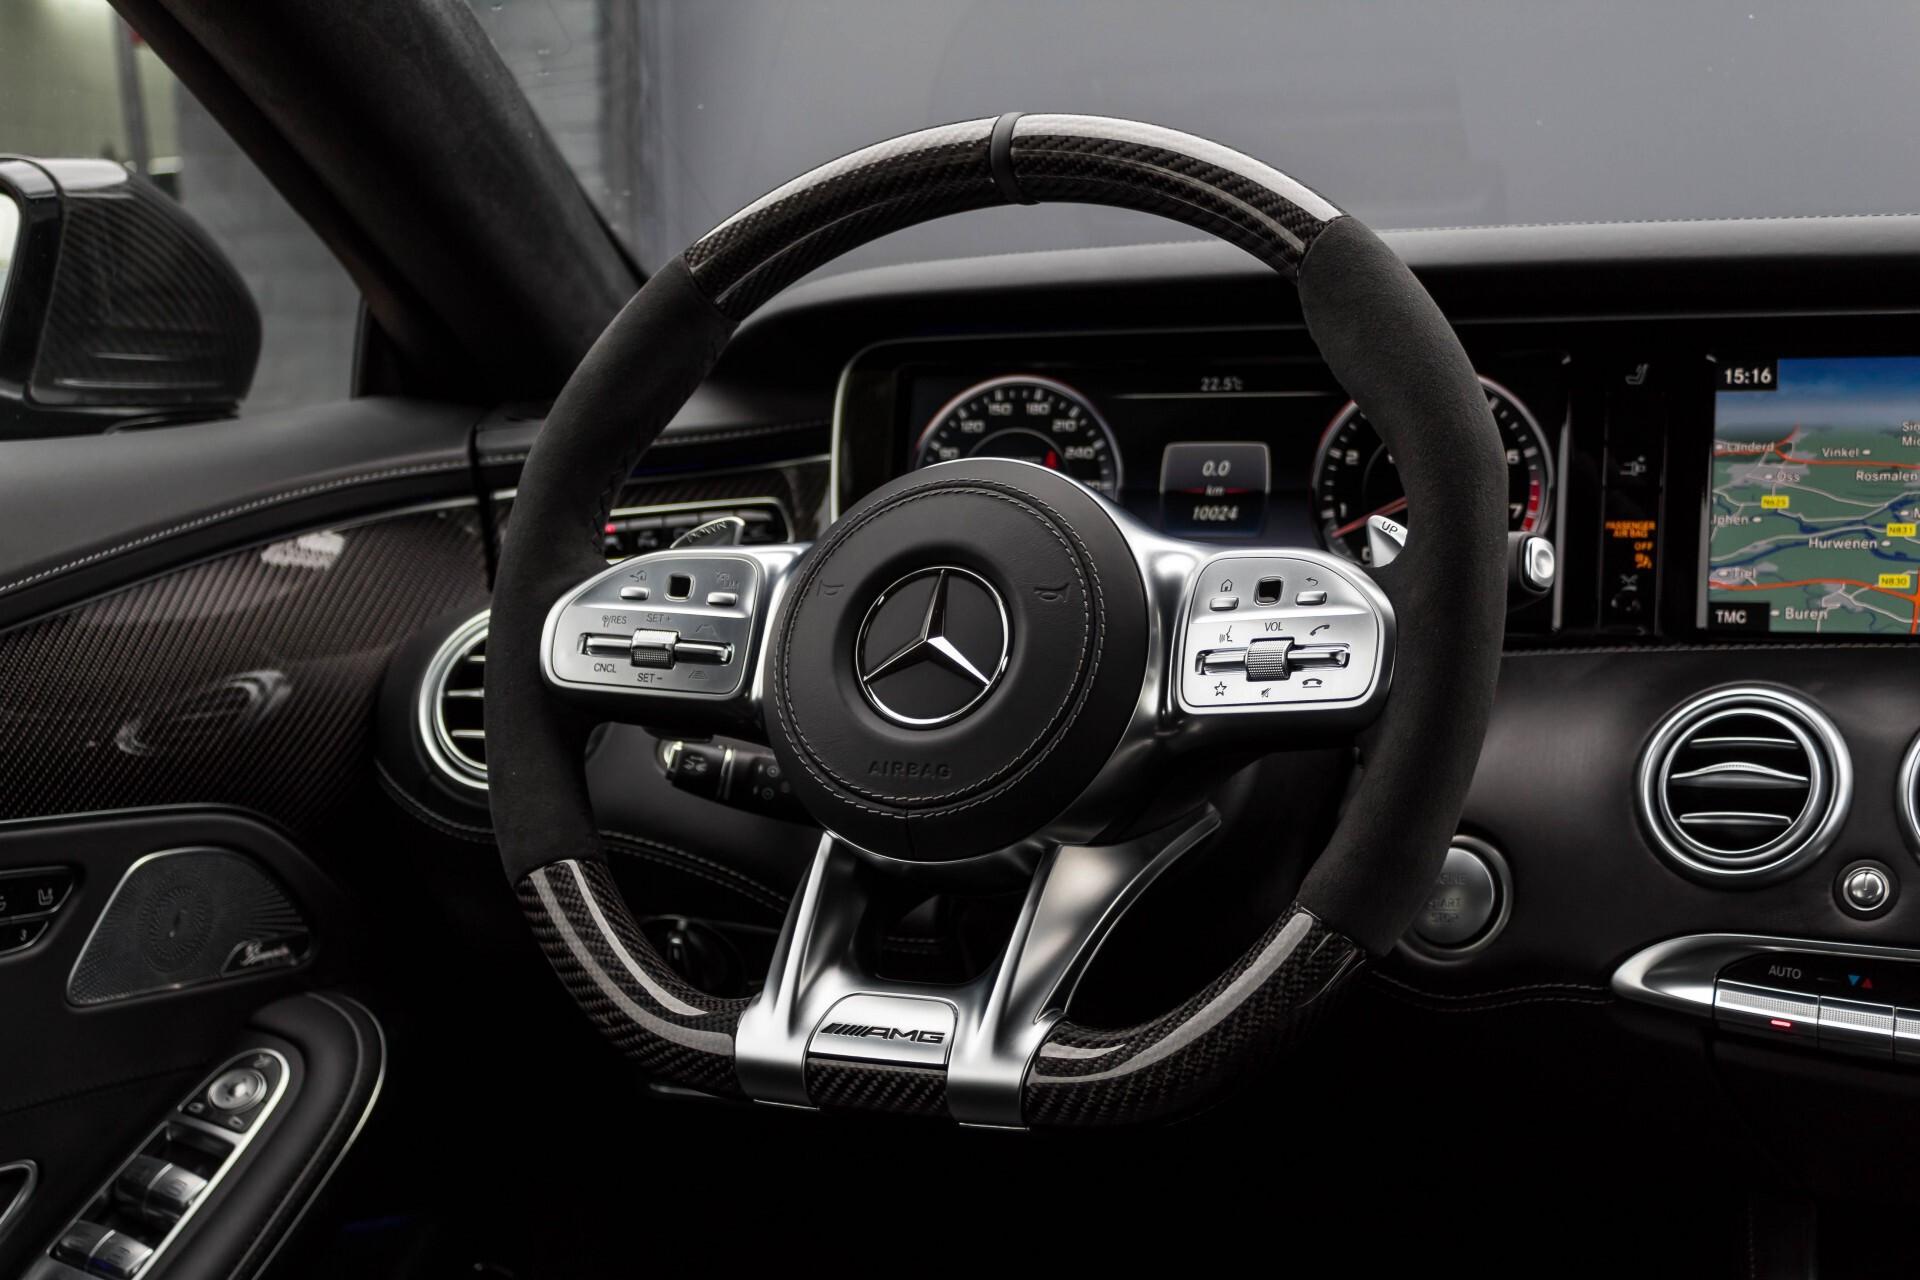 Mercedes-Benz S-Klasse Cabrio 63 AMG 4-M Ceramic/Designo/Carbon/Burmester High End Aut Foto 10